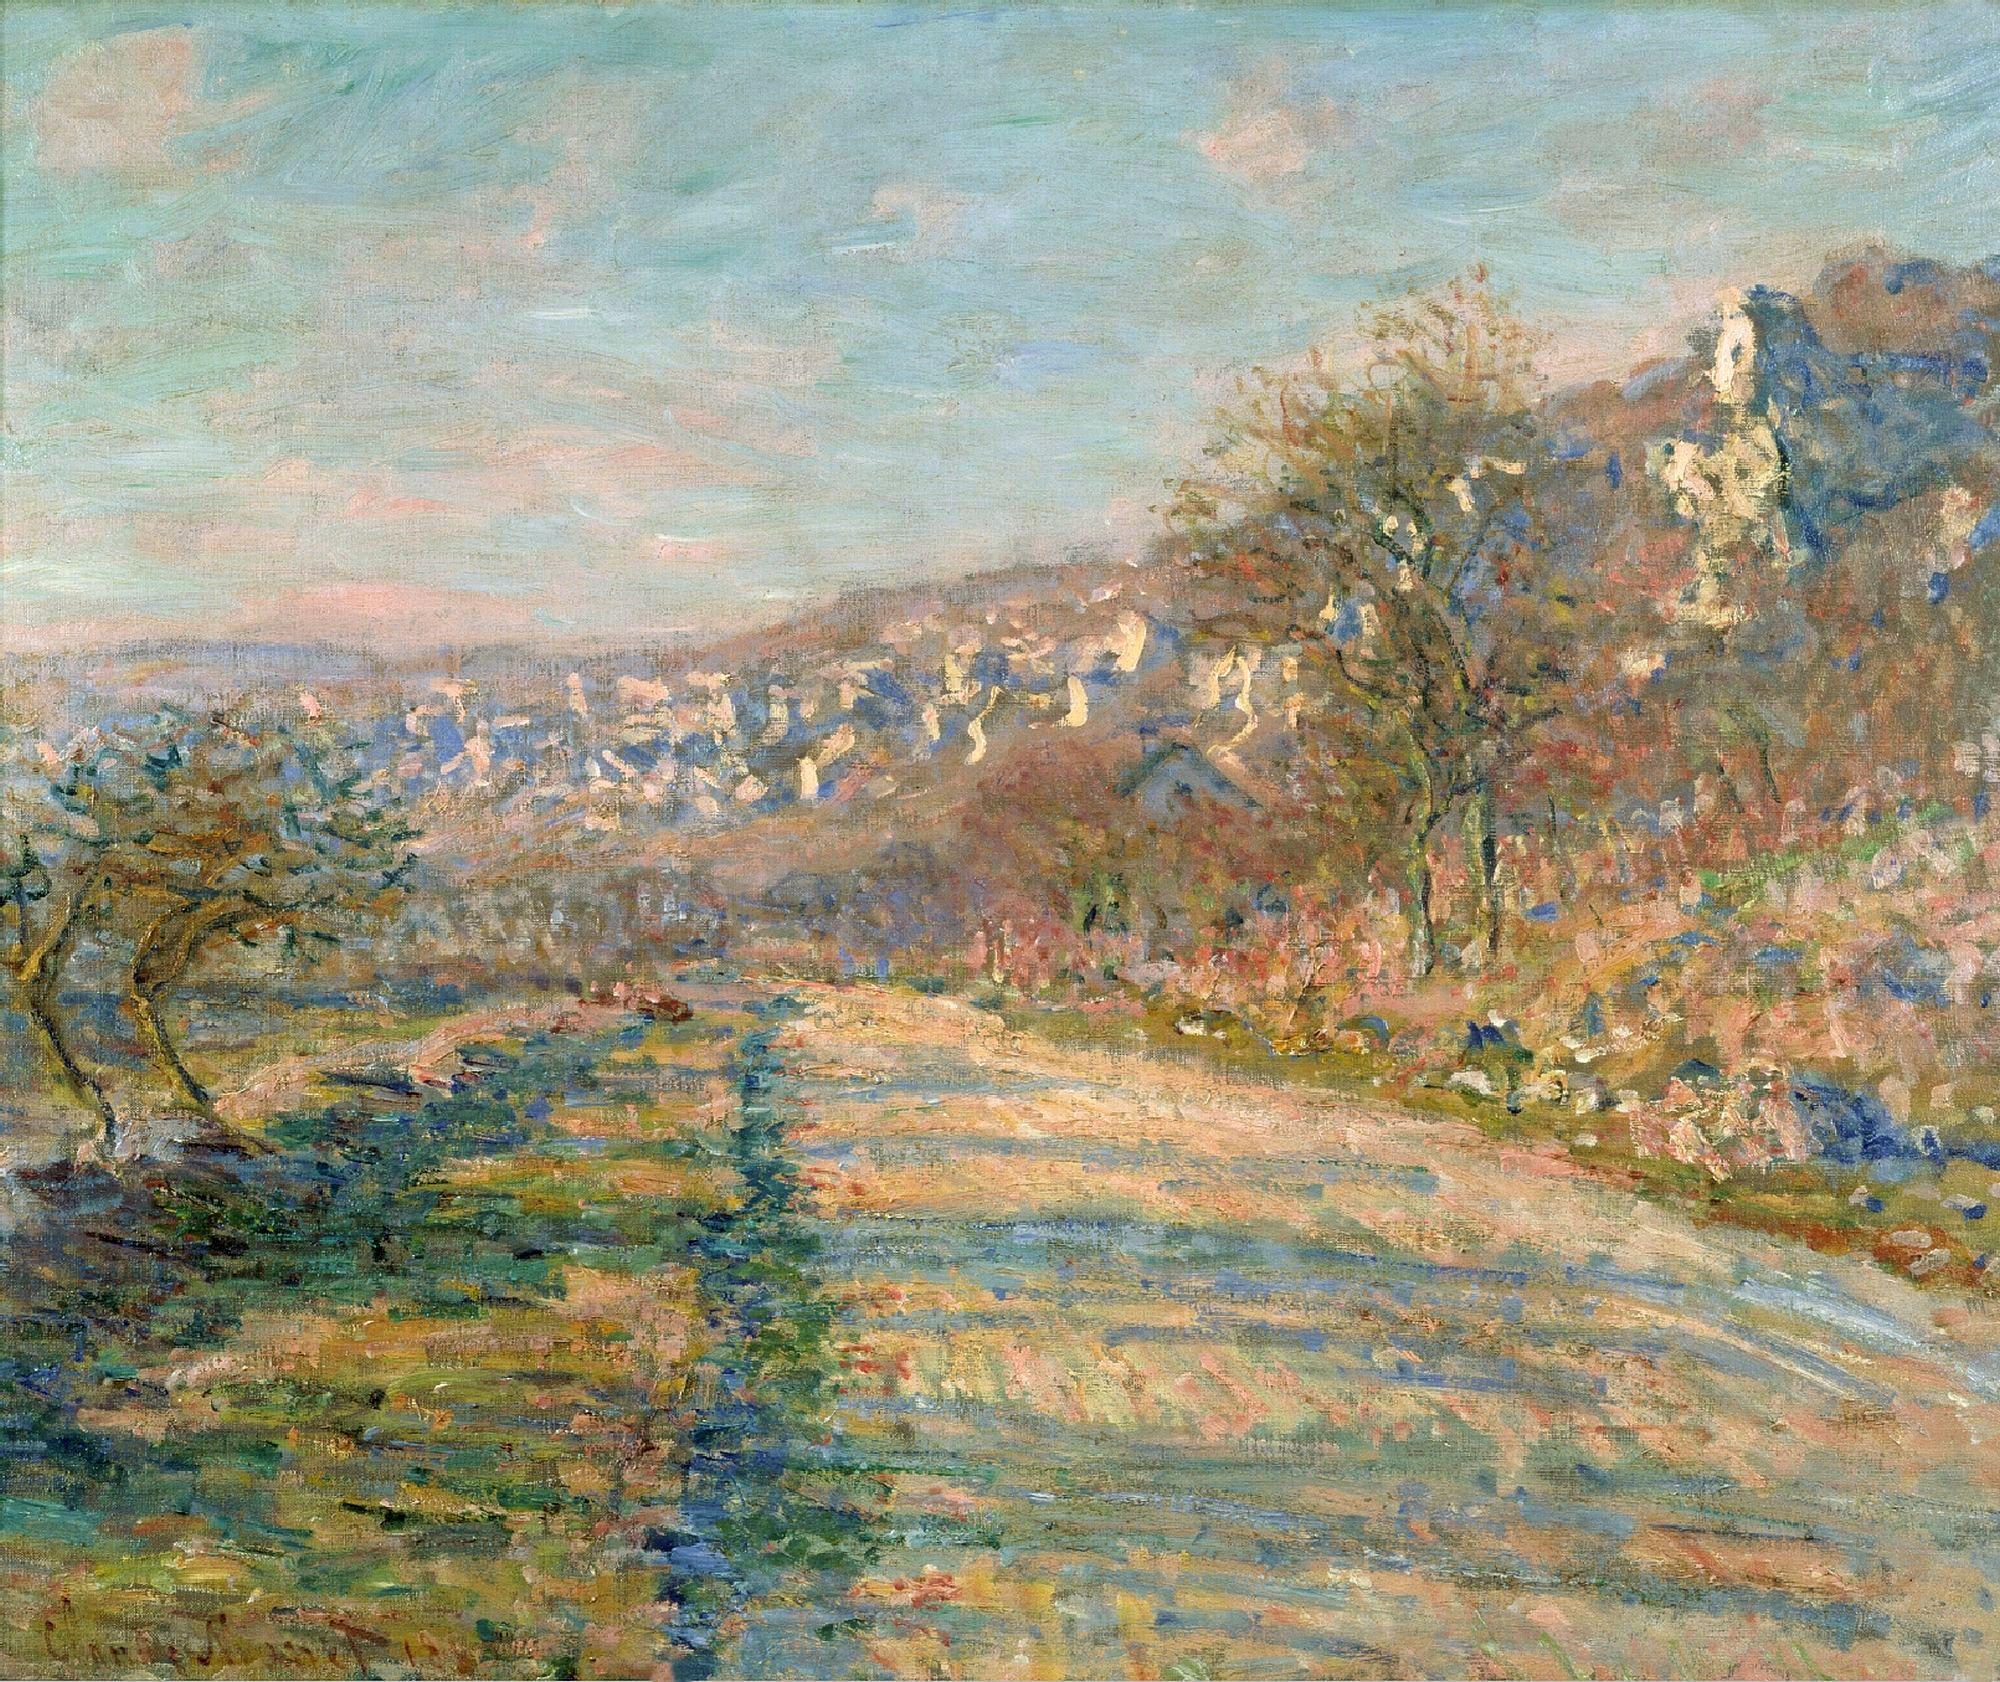 Road of La Roche-Guyon by @claude_monet #impressionism